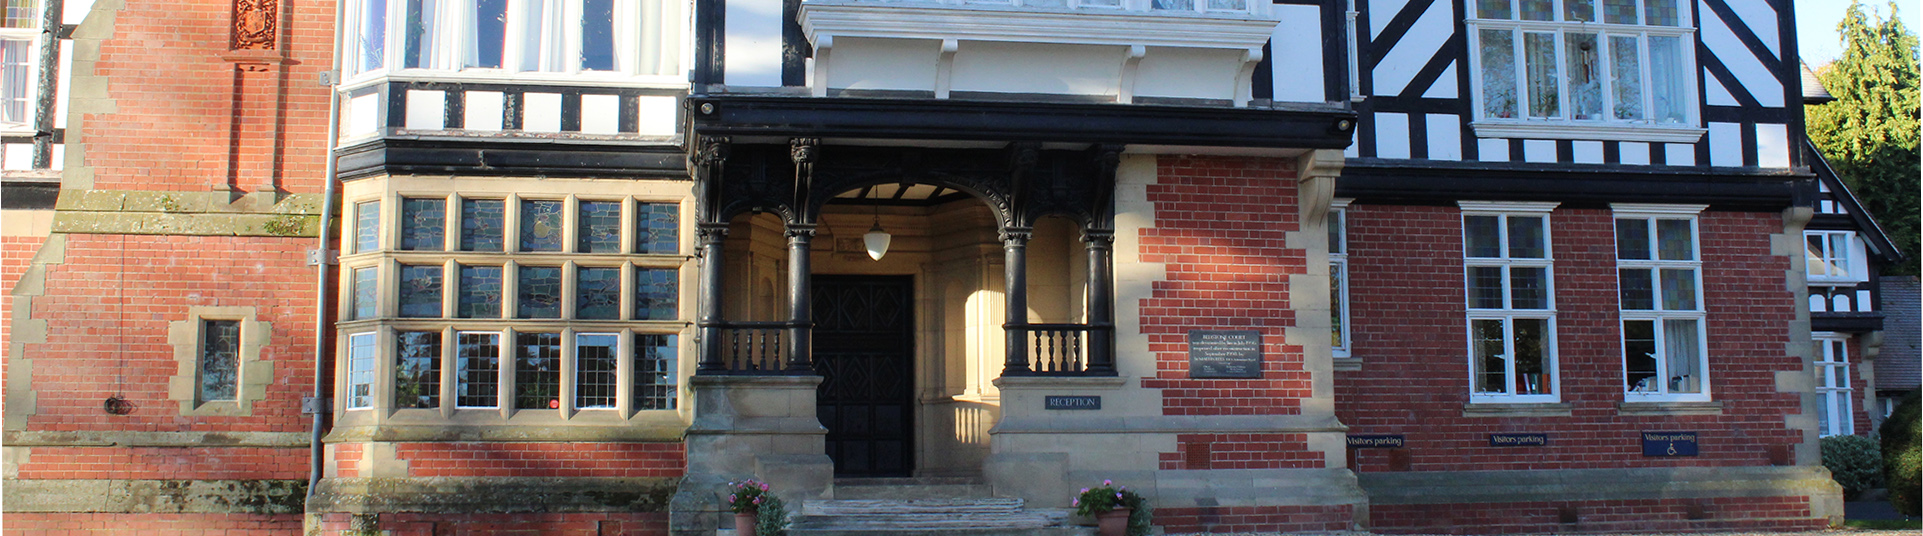 Bedstone Court